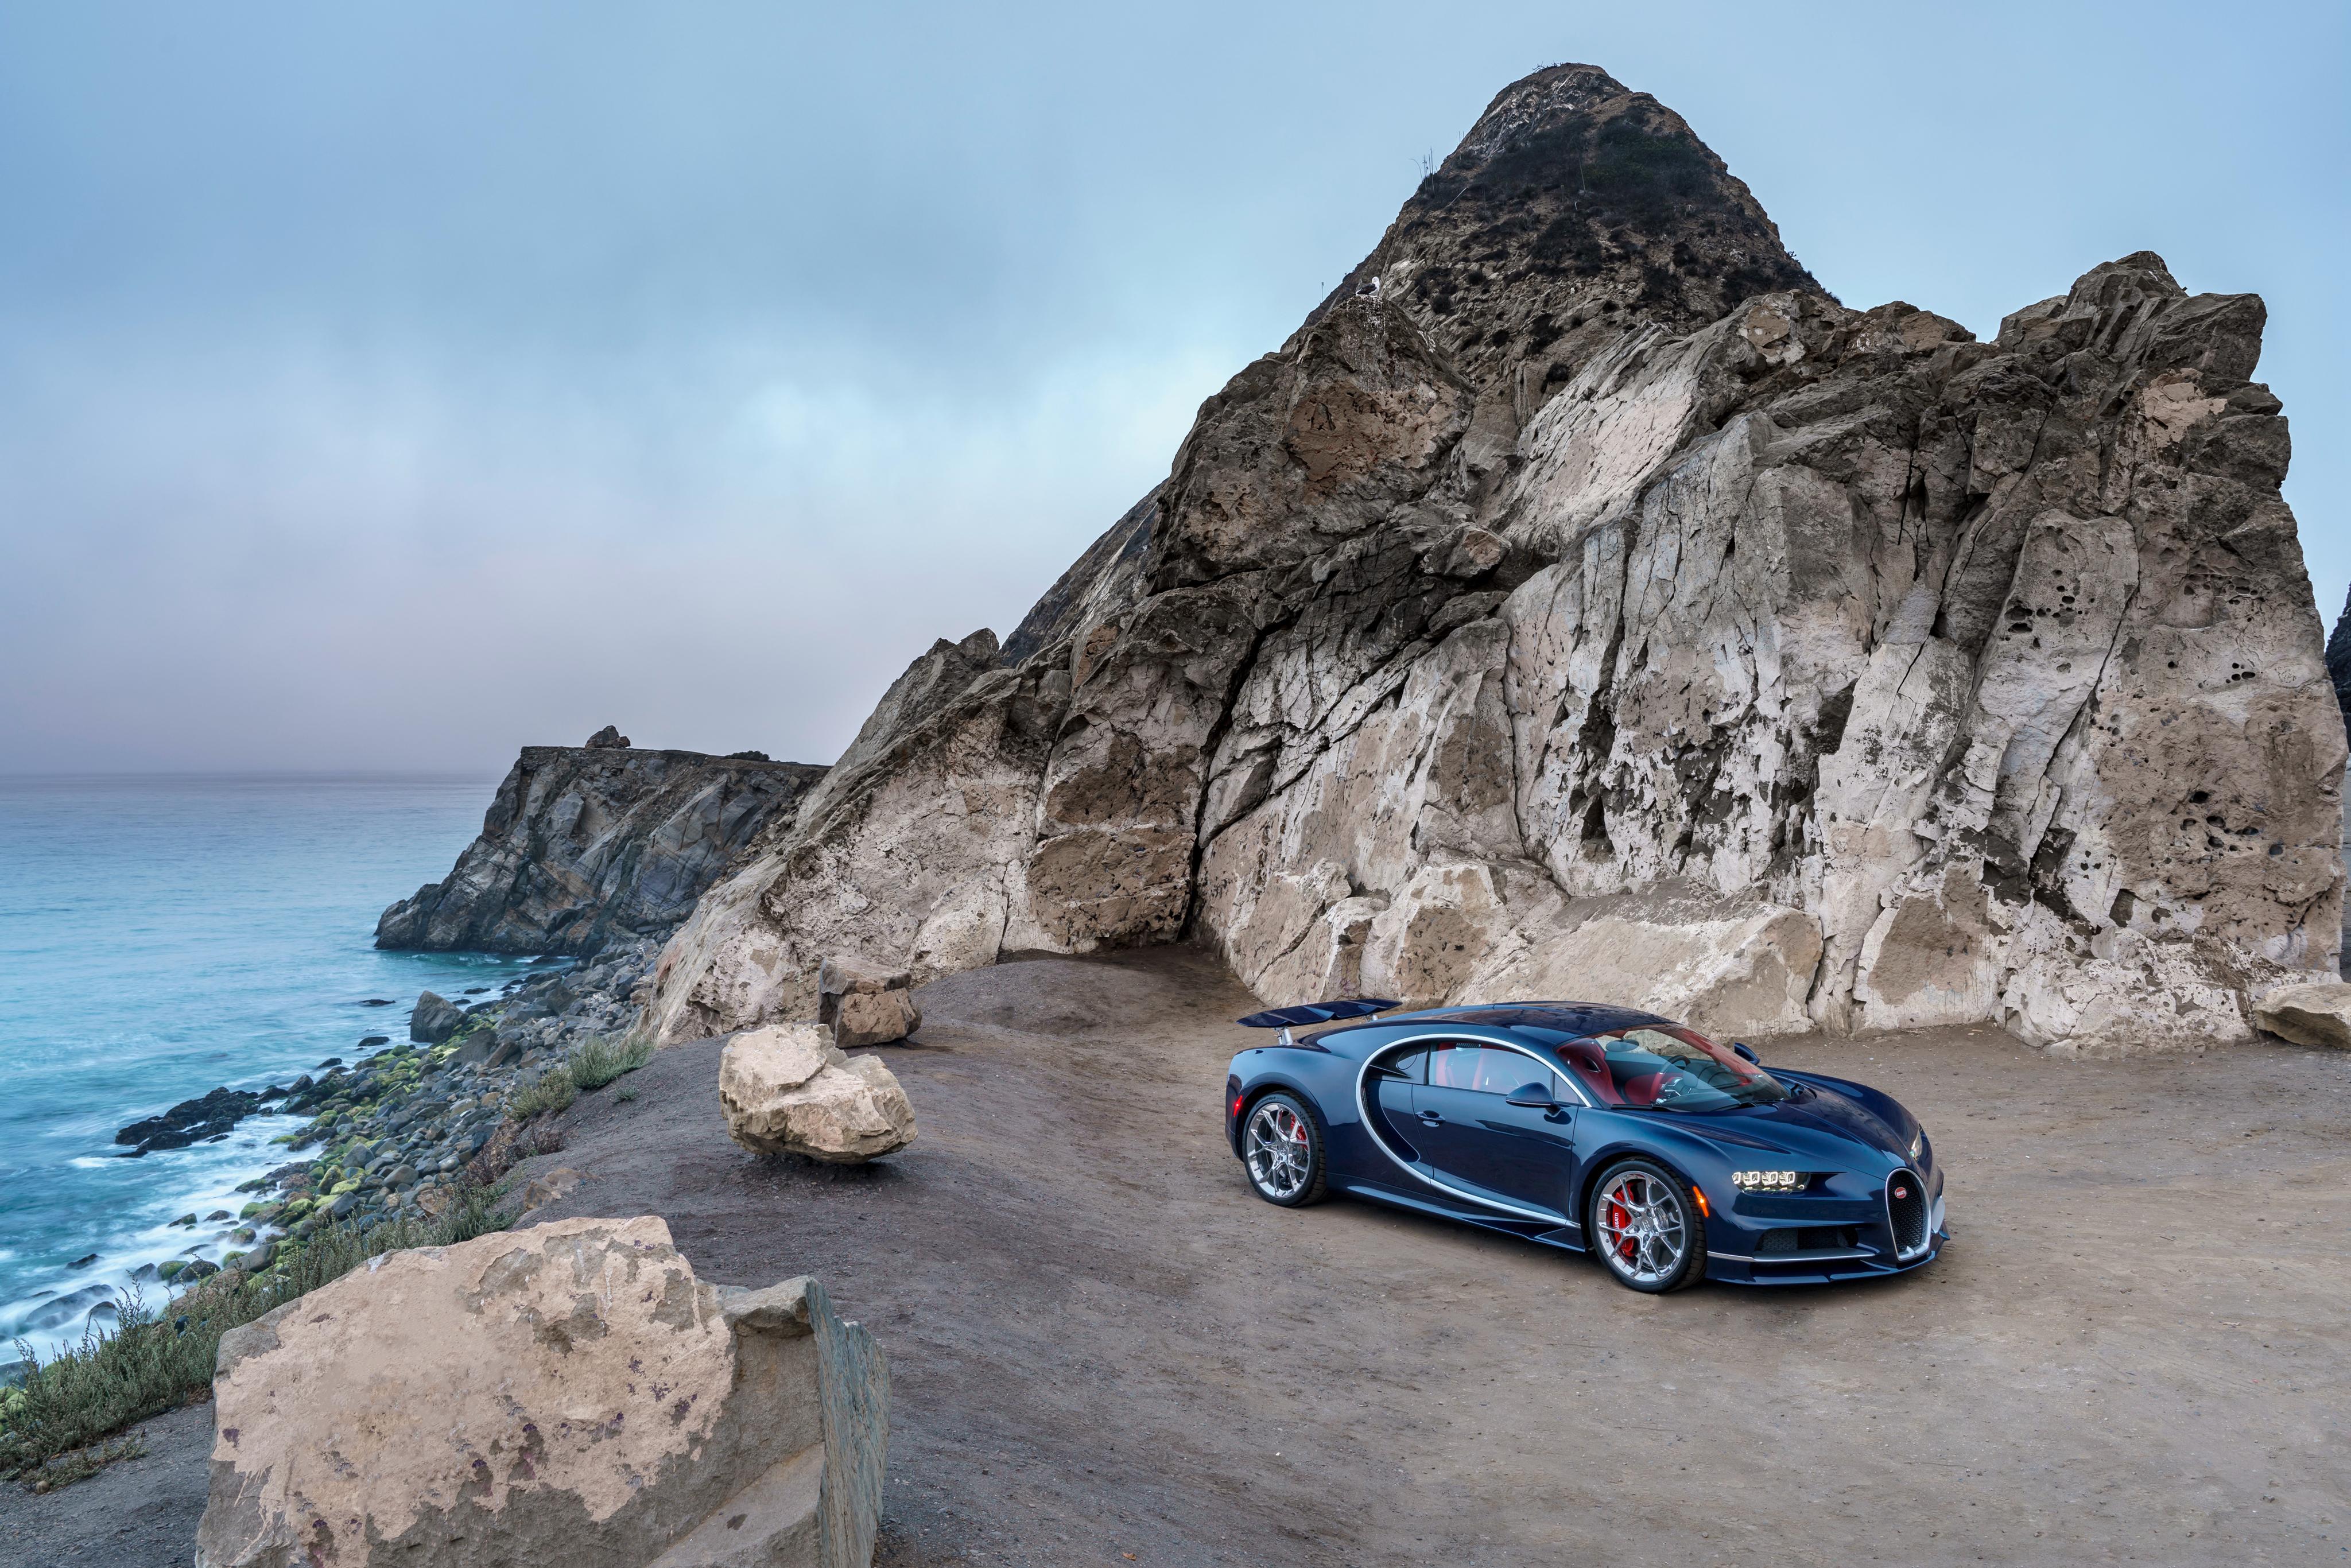 76459 скачать обои Бугатти (Bugatti), Синий, Тачки (Cars), Вид Сбоку, Chiron - заставки и картинки бесплатно